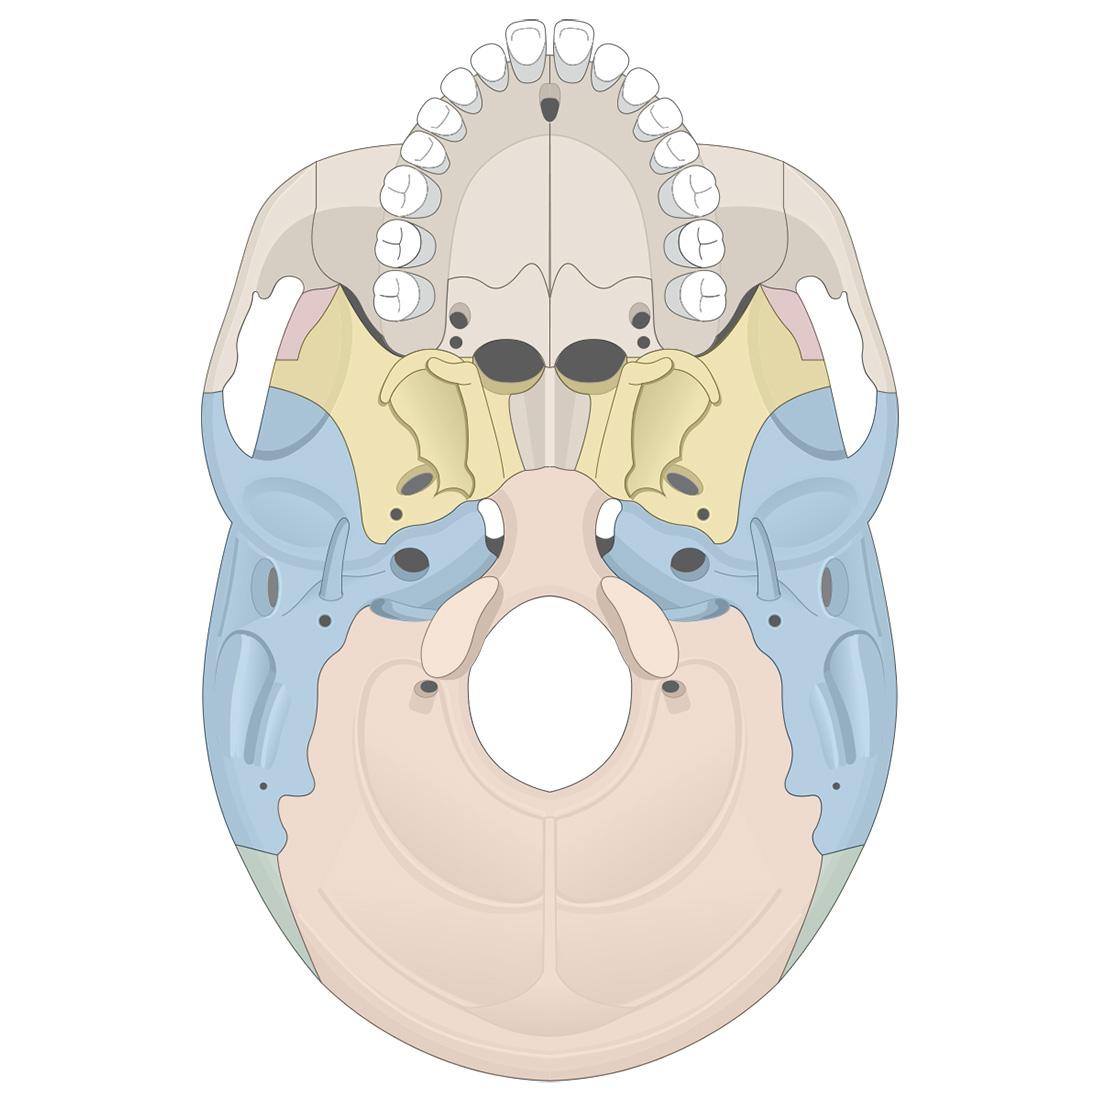 Cranial bones: inferior view of the skull